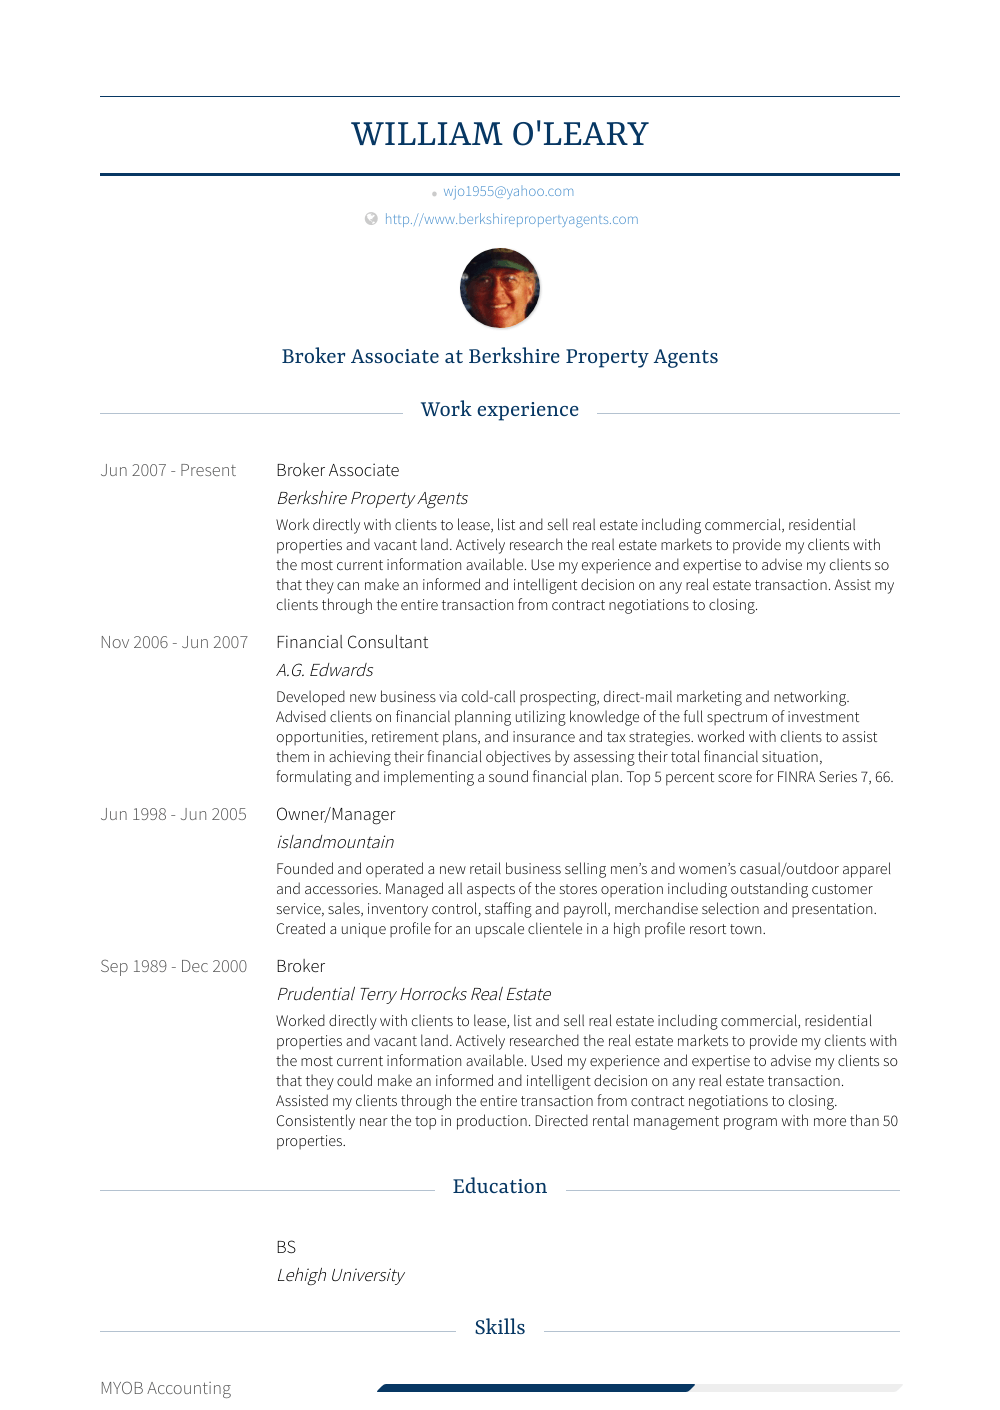 Broker Associate - Resume Samples & Templates | VisualCV